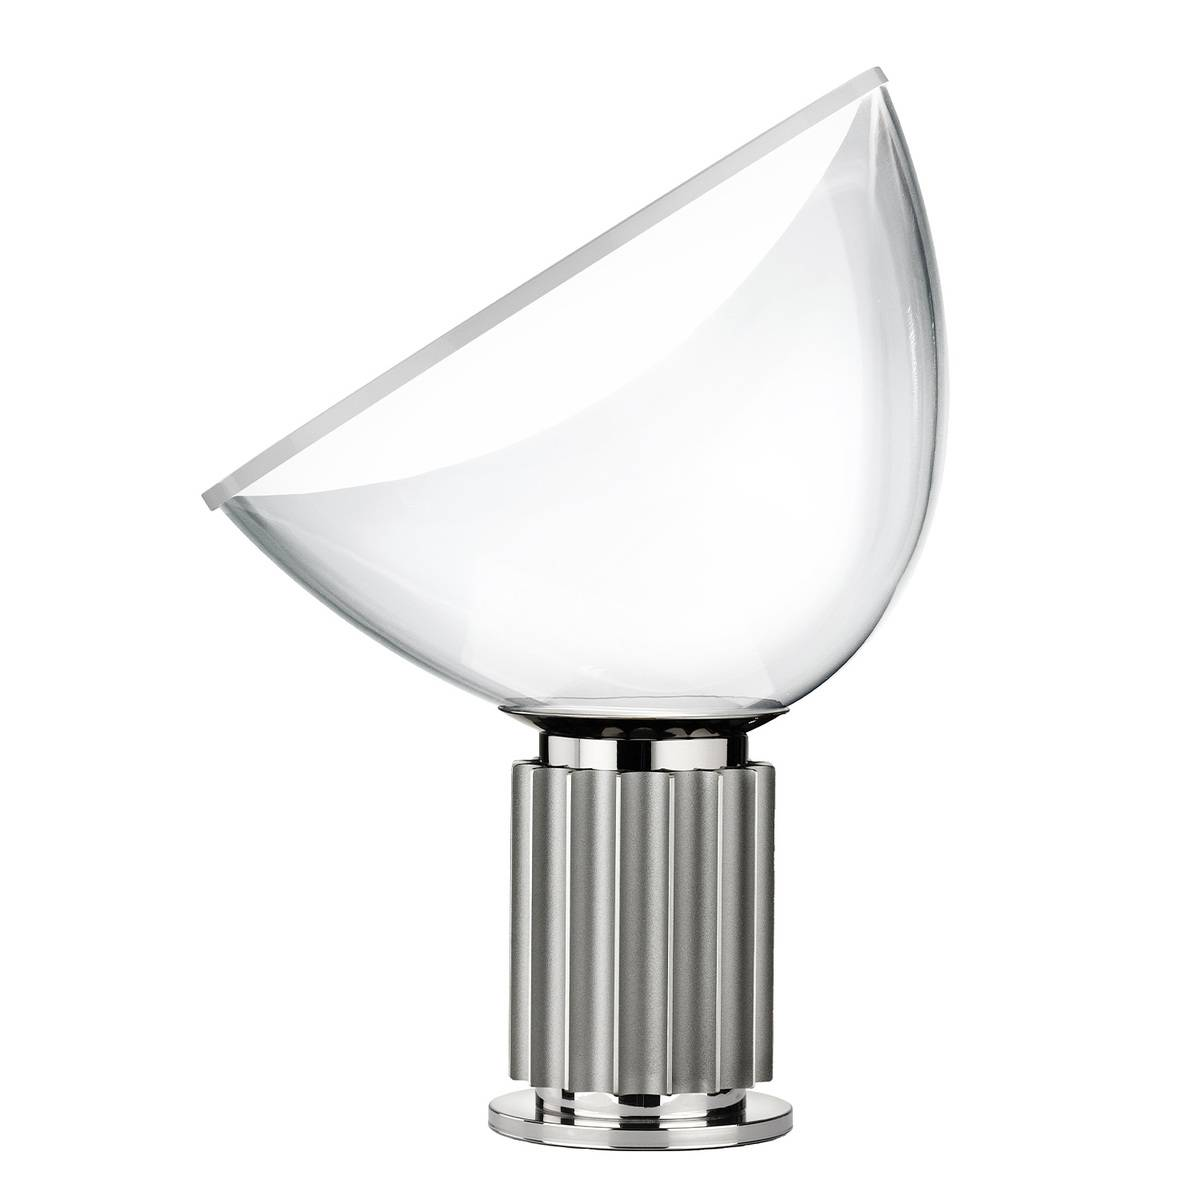 Flos Taccia pöytävalaisin, pieni, hopea